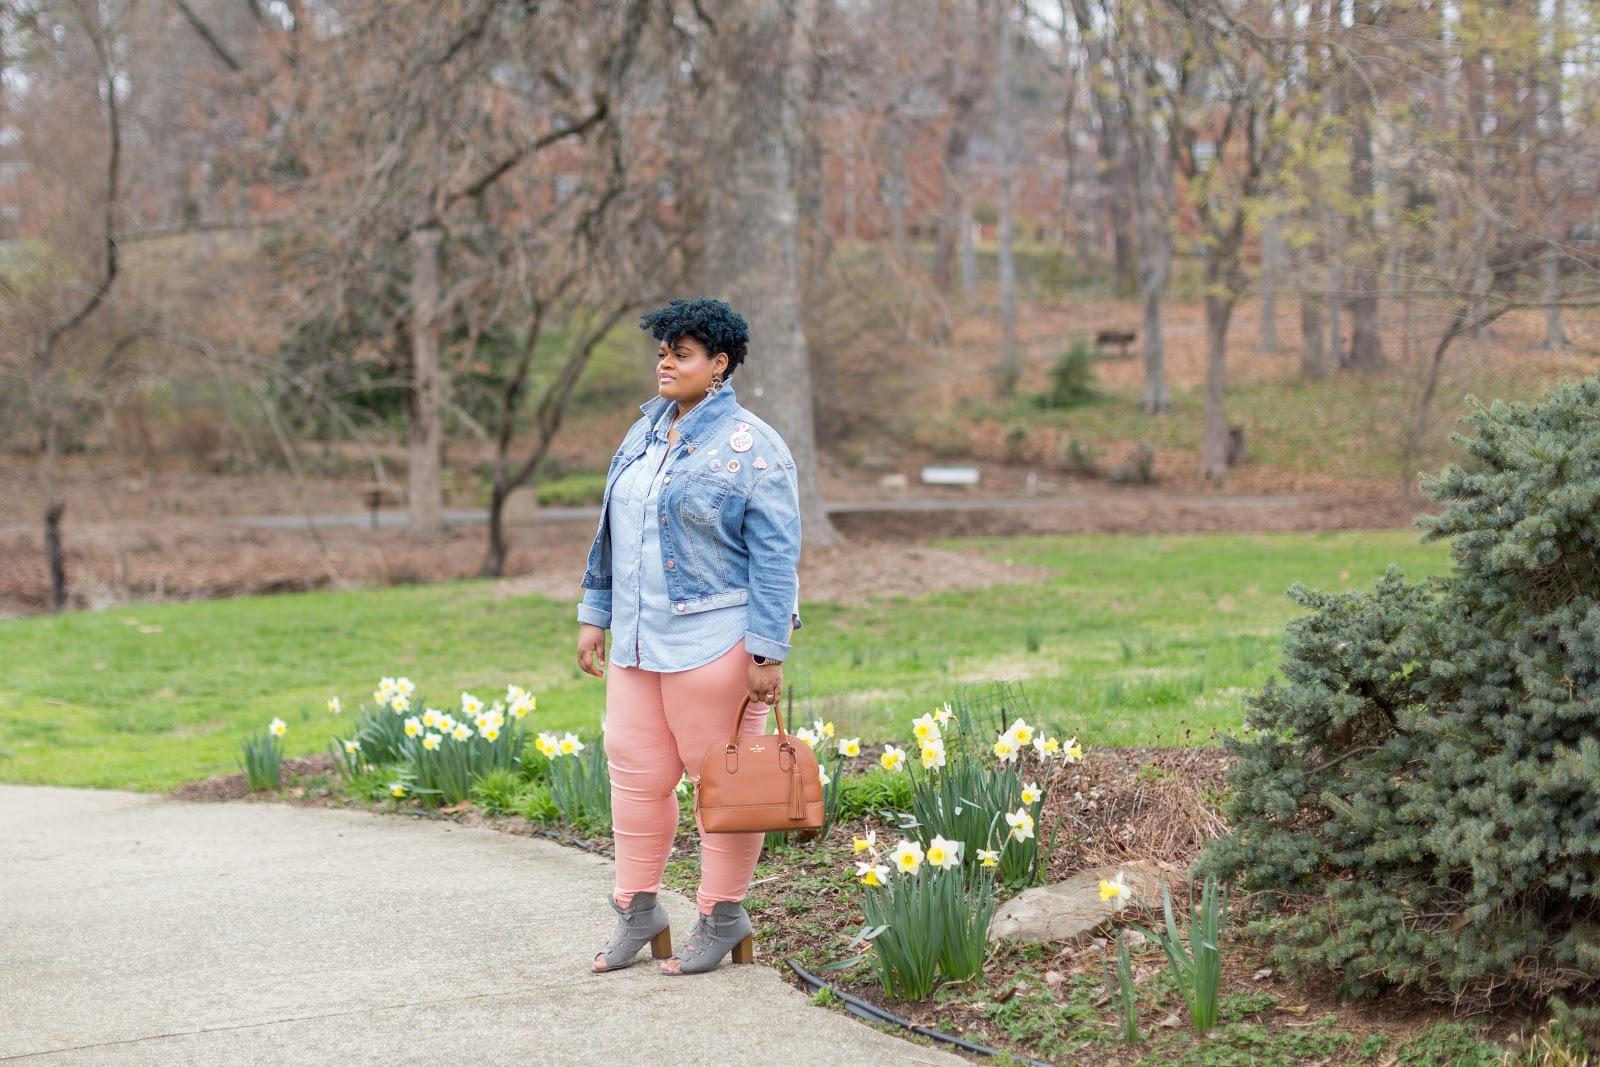 Four Fabulous Ways to Spring Into Style